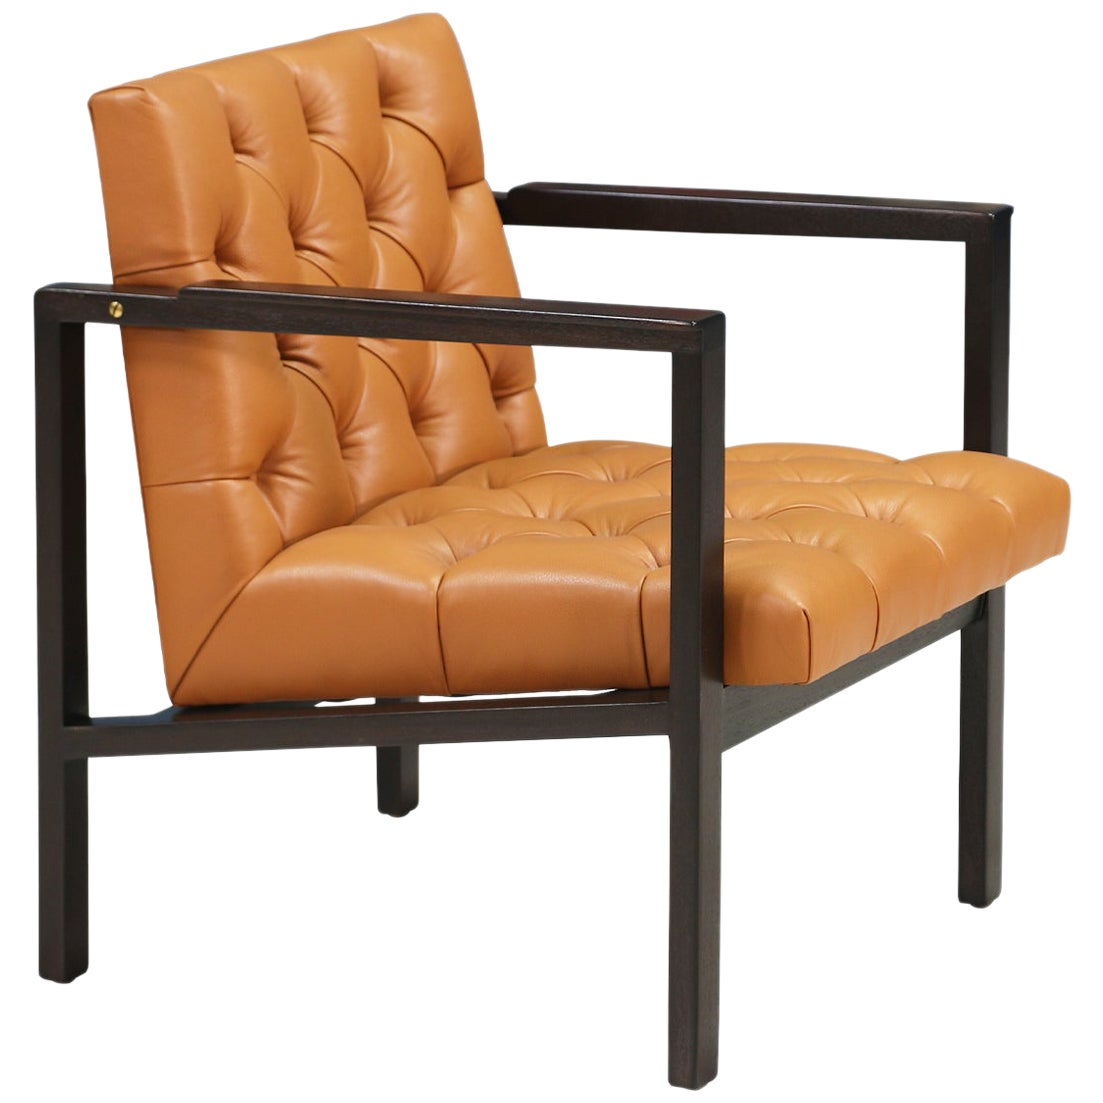 Edward J. Wormley Tufted Lounge Chair for Dunbar